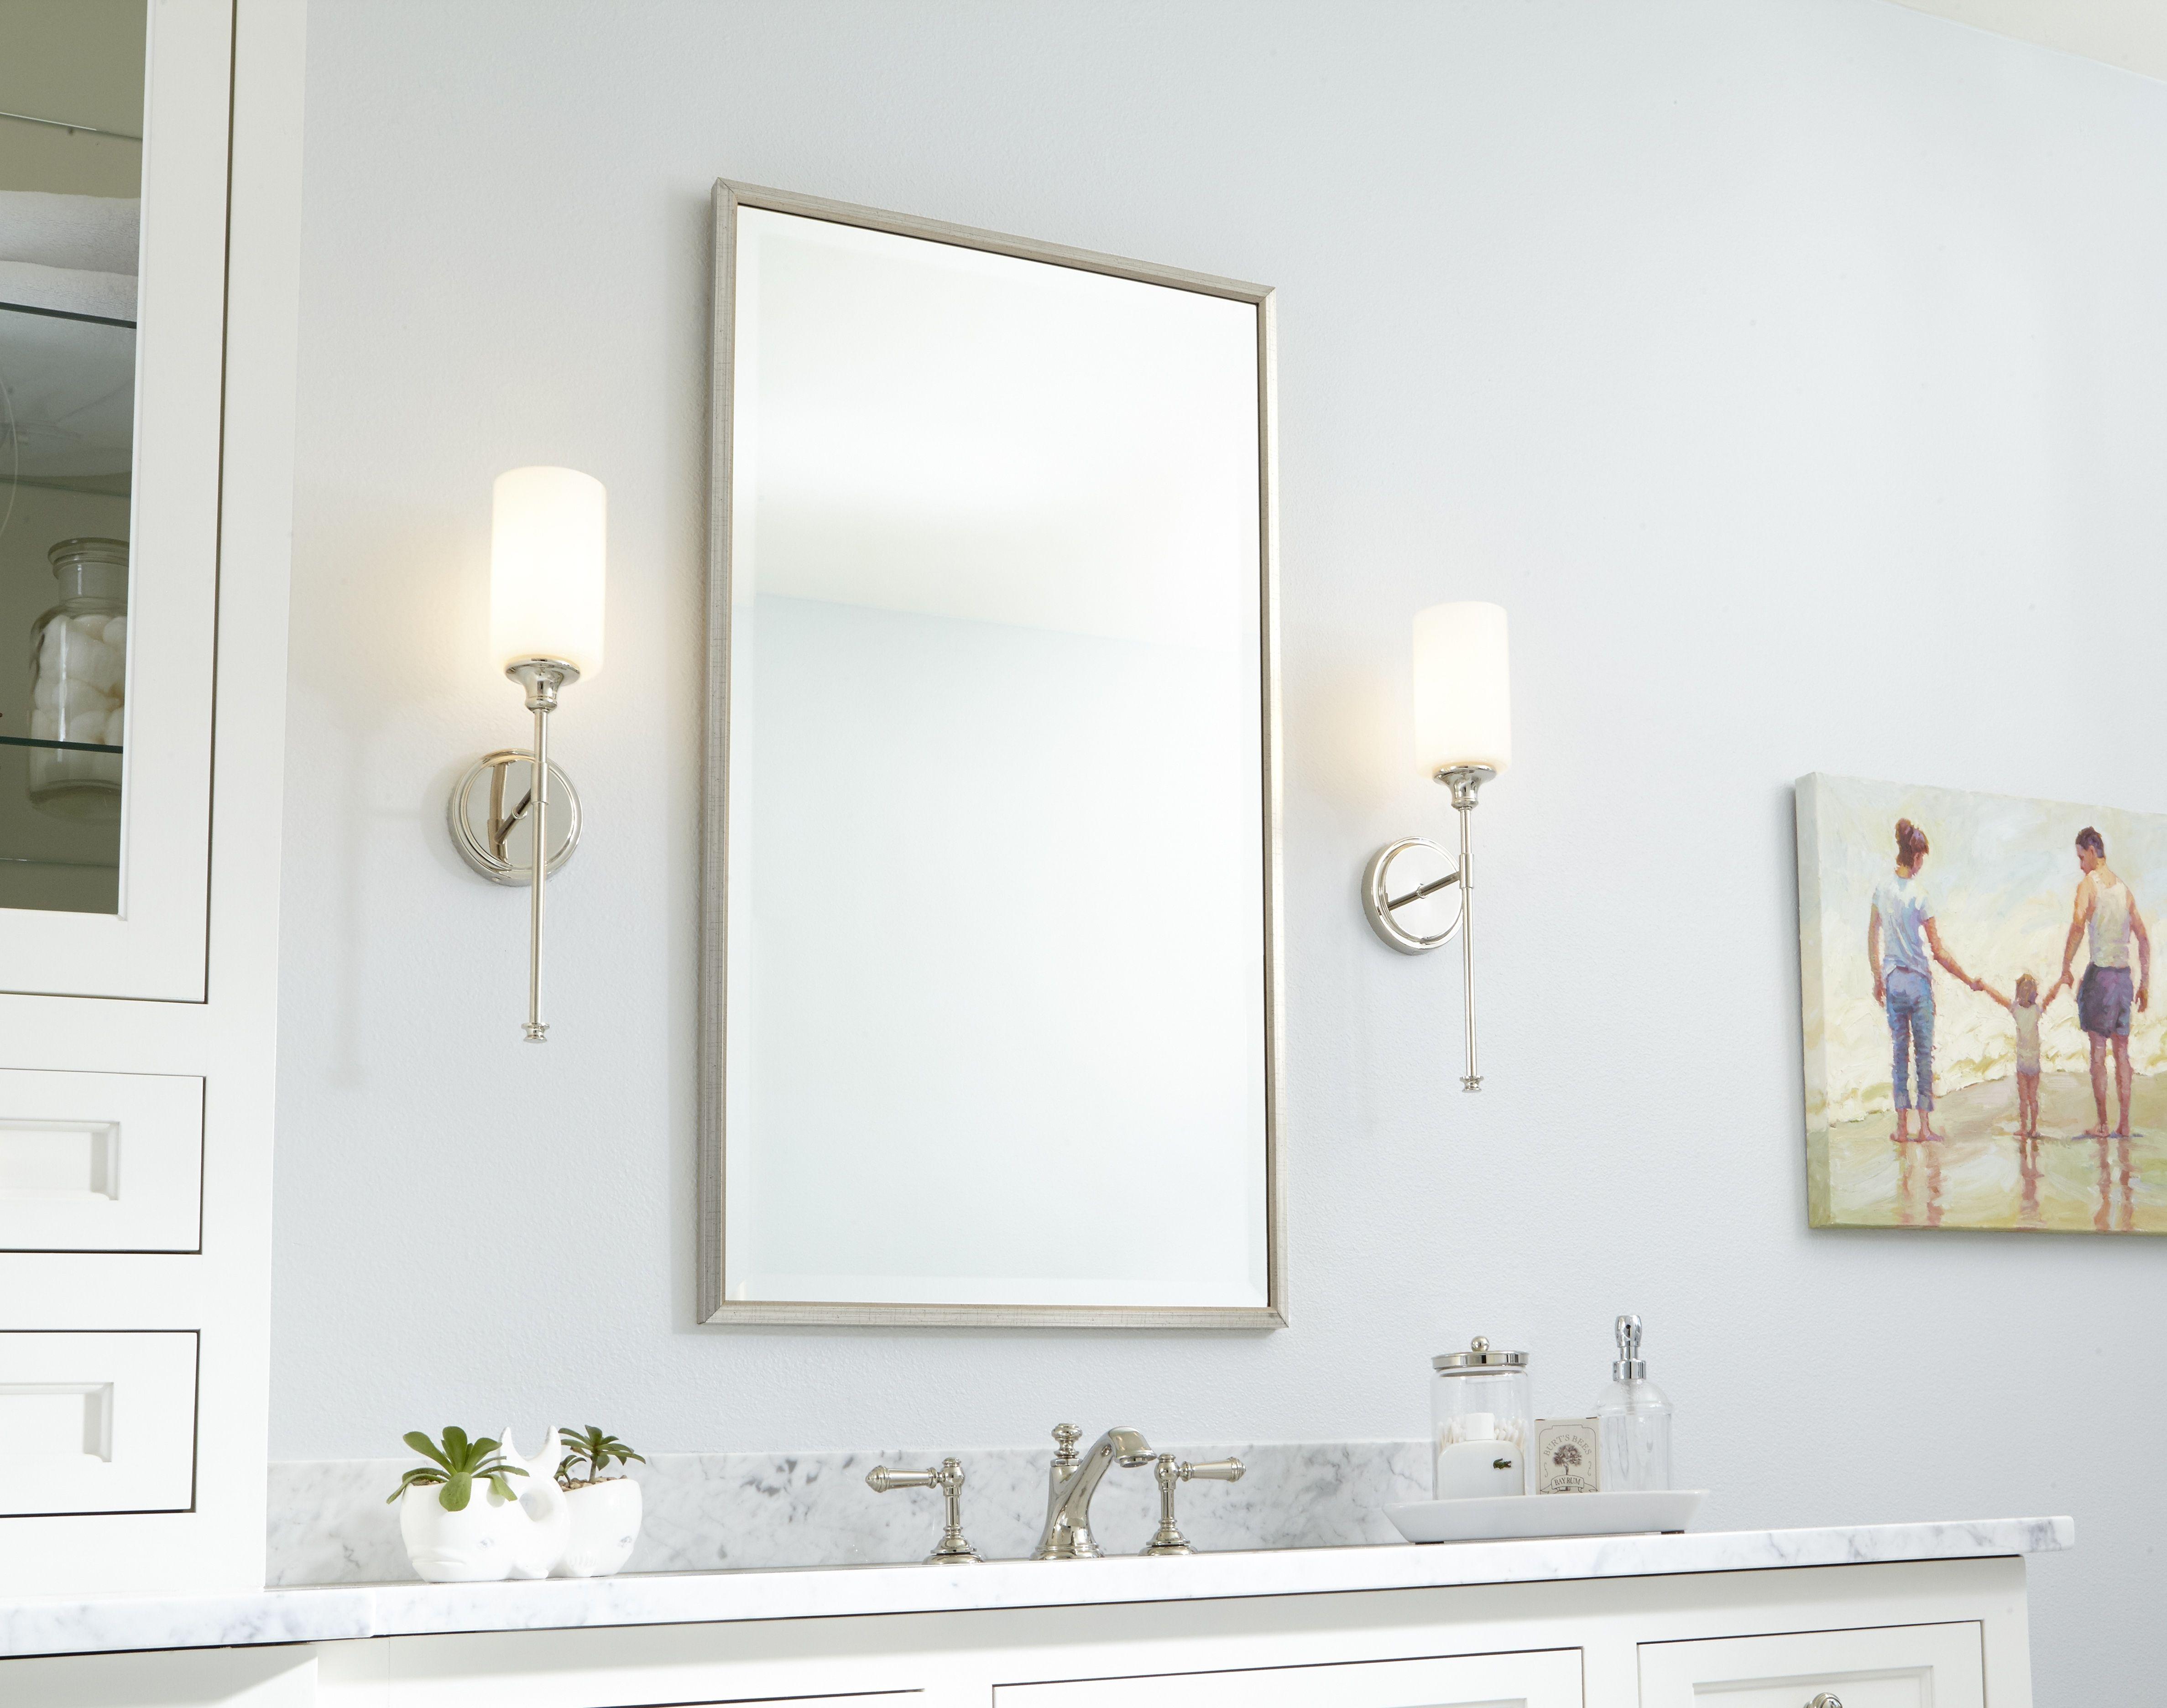 Bathroom Light Fixtures Guide How To Light A Bathroom Mirror